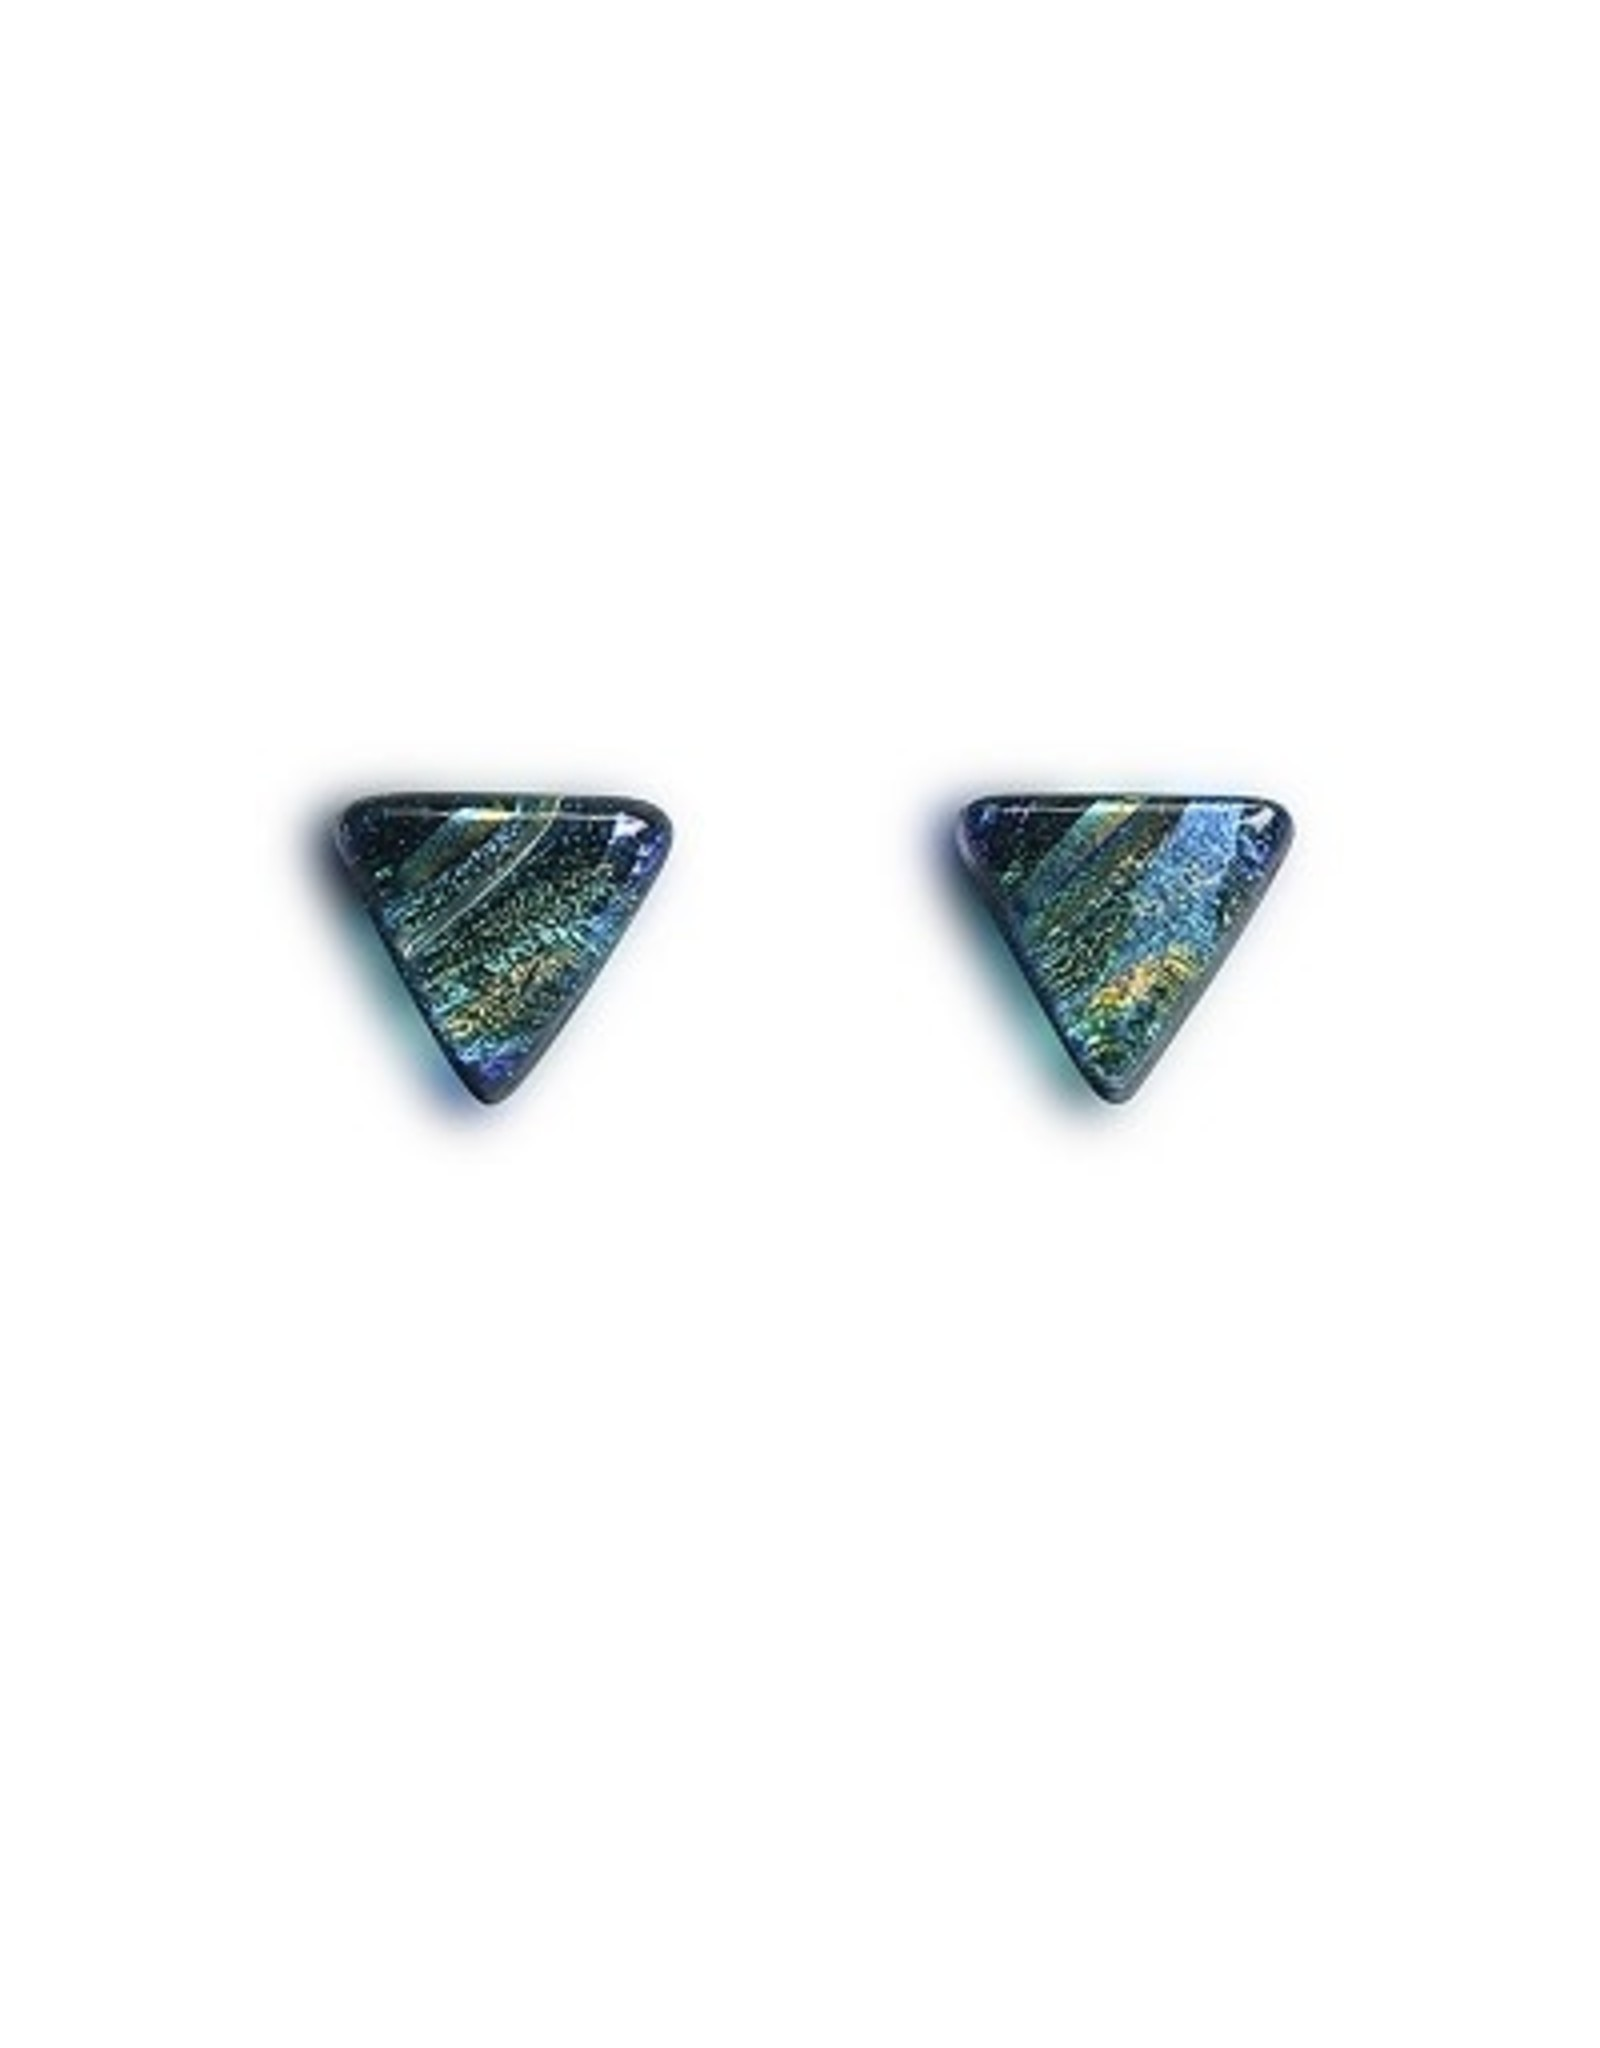 Renaissance Glass RENAISSANCE POST EARRINGS (Dichroic Art Glass, Assorted Colors, #220, FRAT)